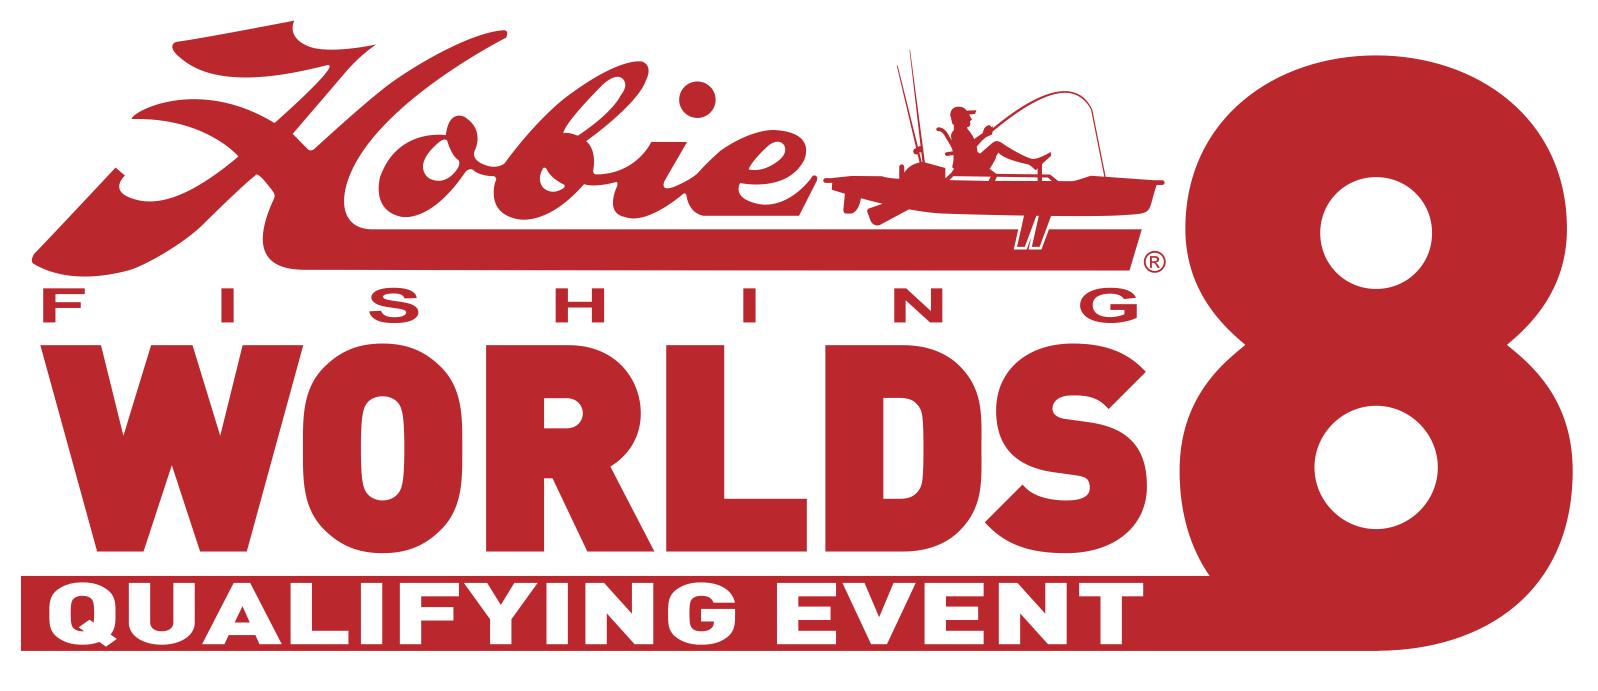 Hobie Worlds 8 Logo - Red